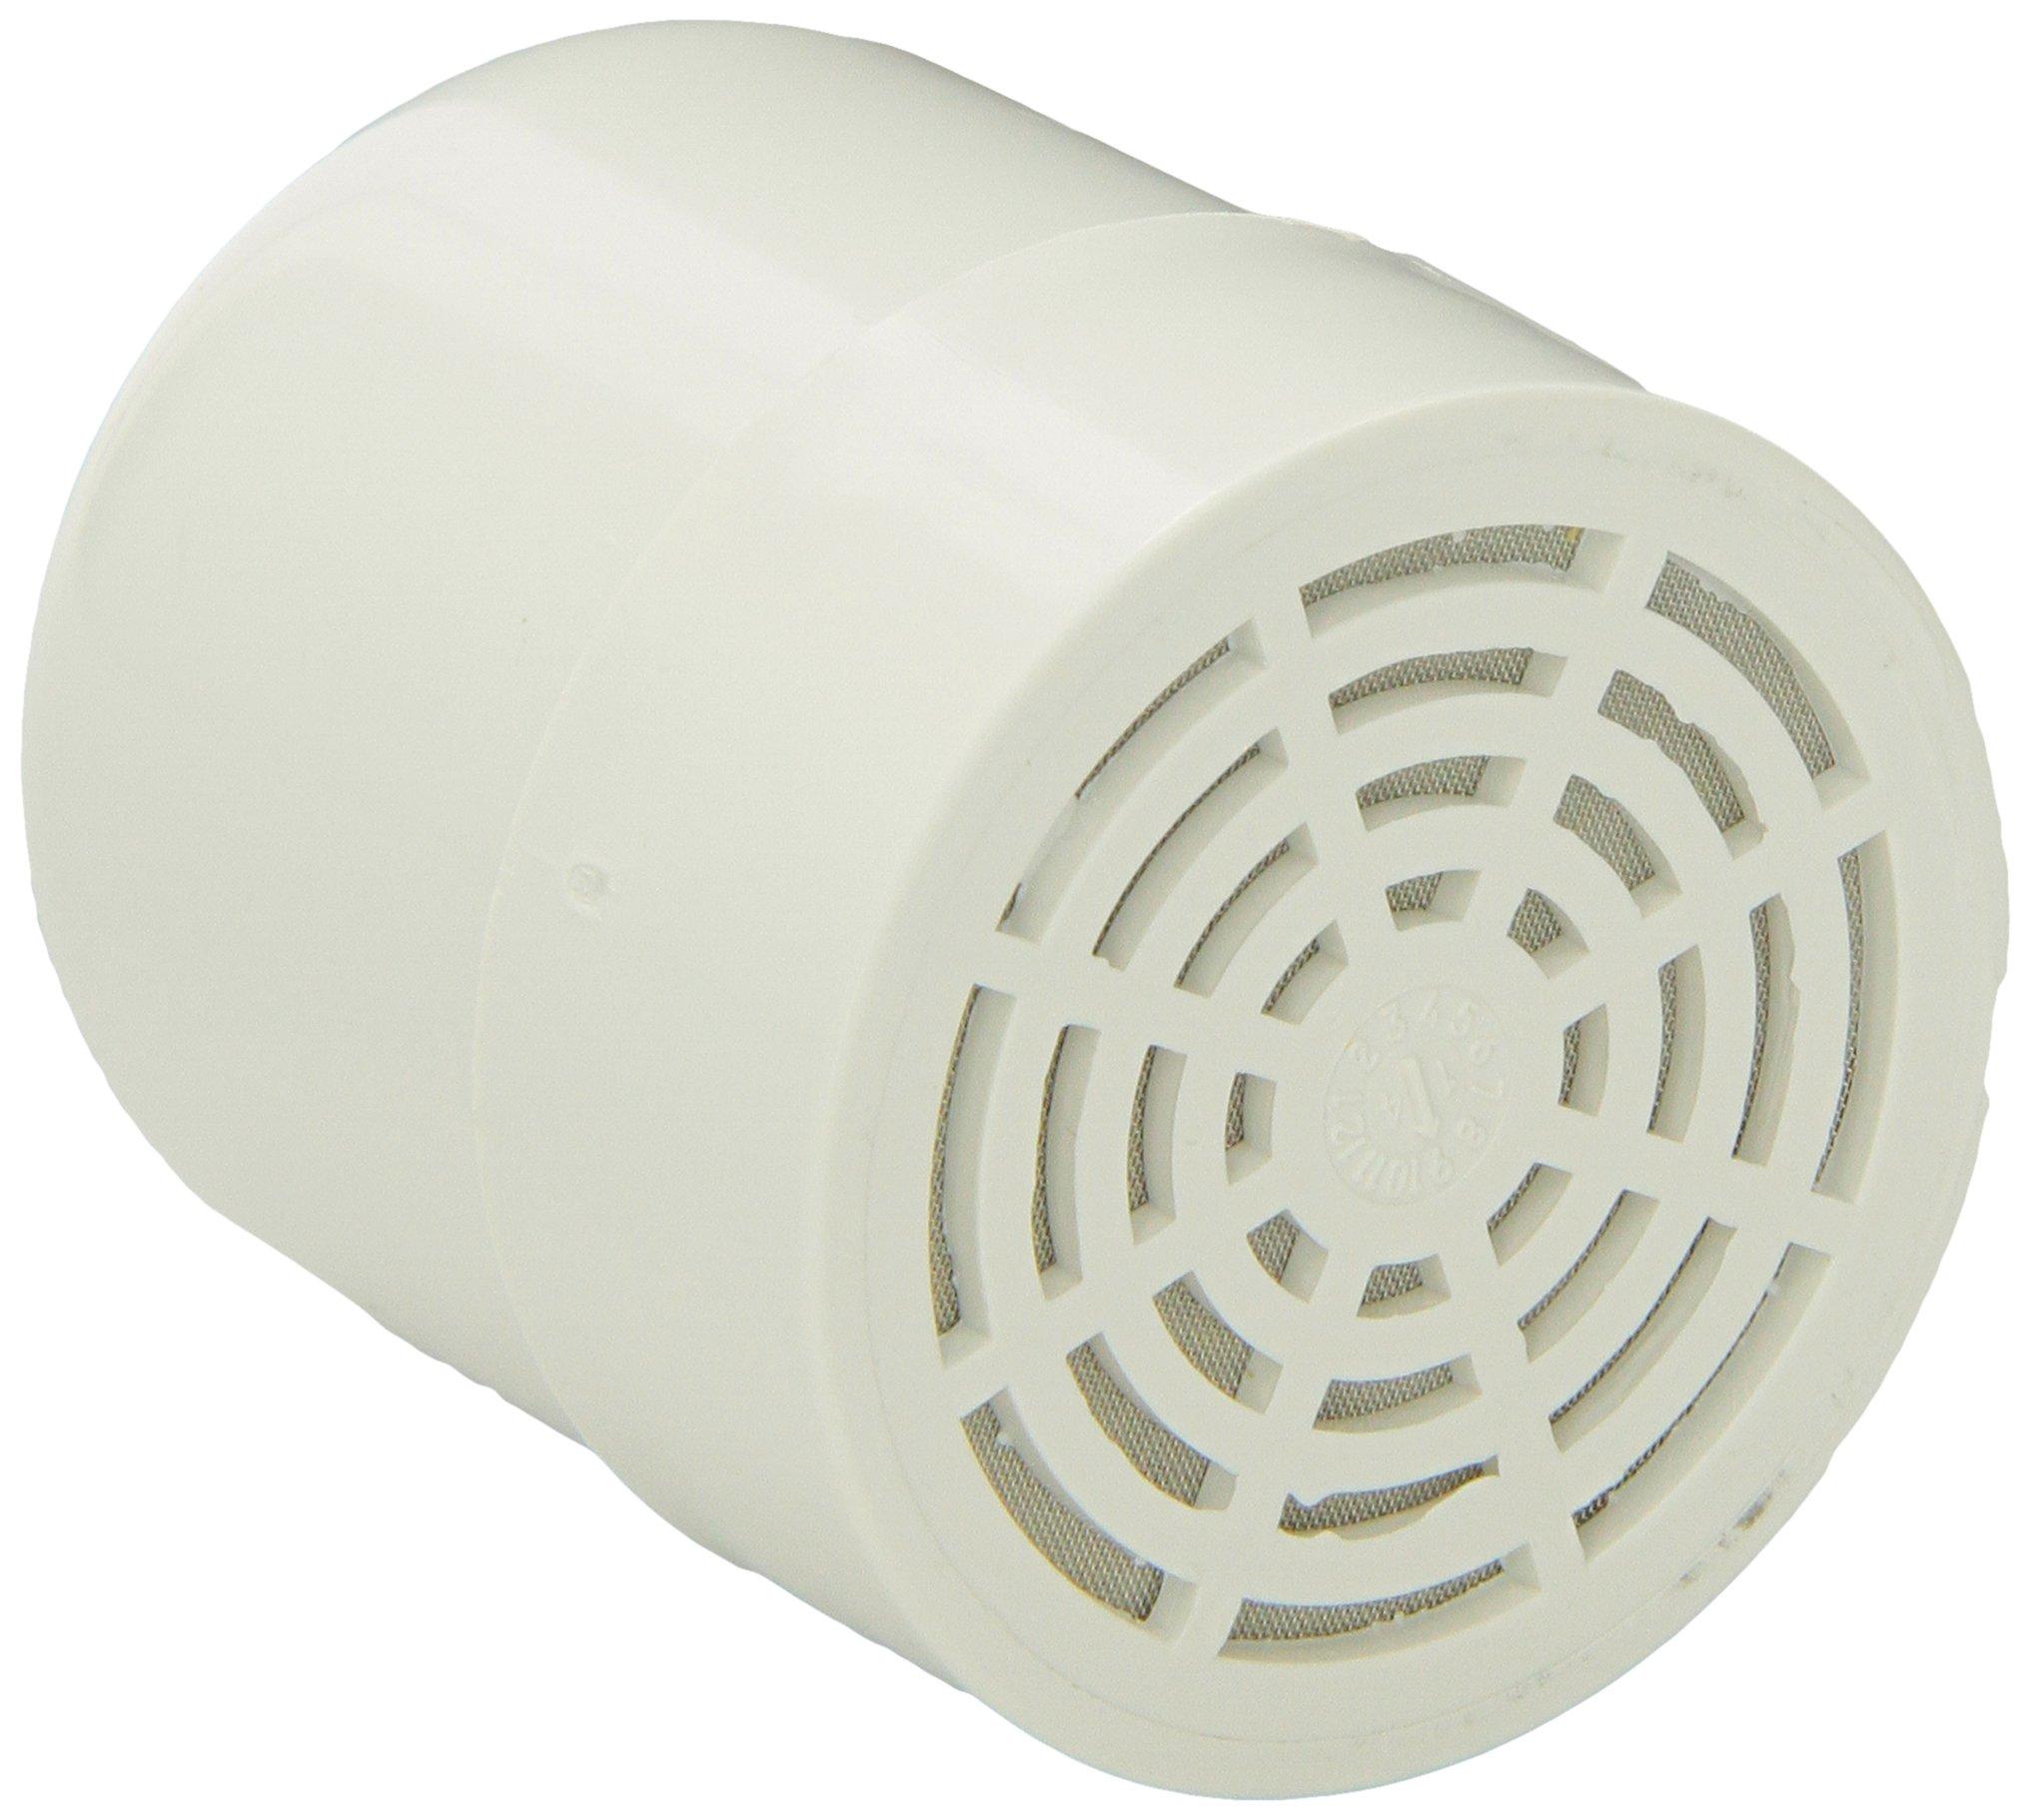 RAINSHOWR-RCCQ-A  CQ1000 Filter Replacement Cartridge for Shower Filter by Rainshow'r